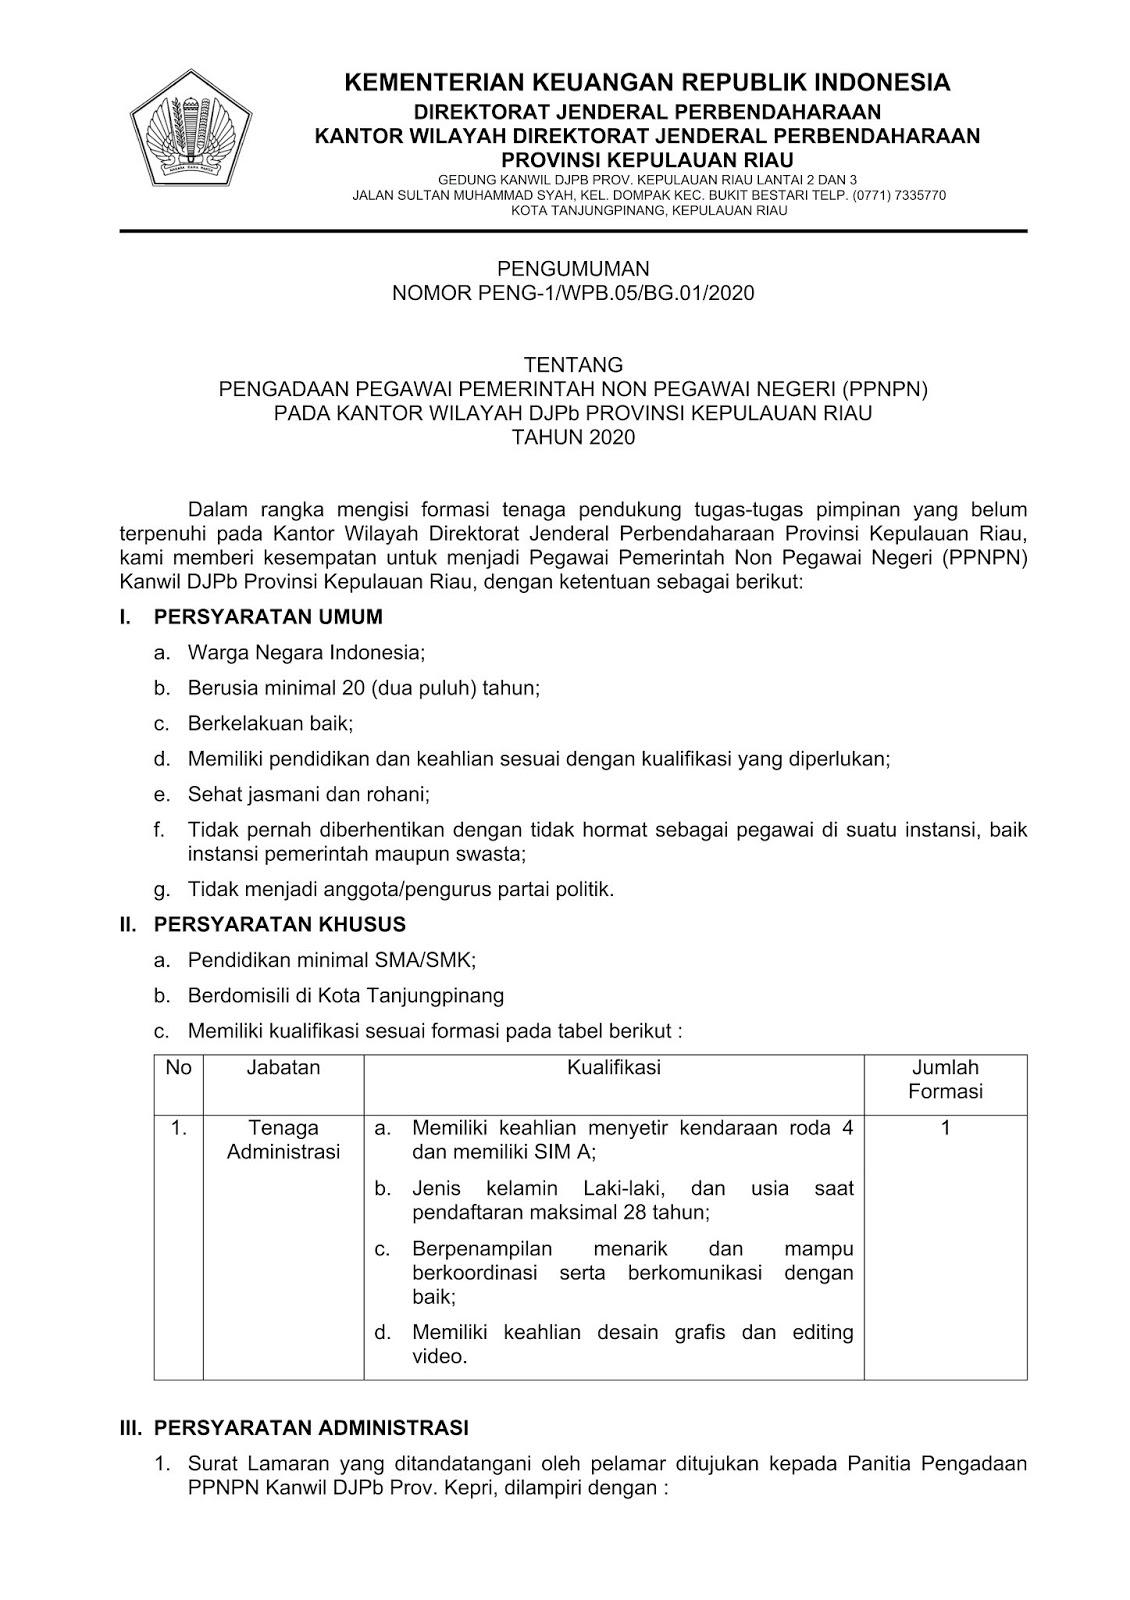 Pengadaan Pegawao Pemerintah Non Pegawai Negeri Direktorat Jenderal Perbendaharaan